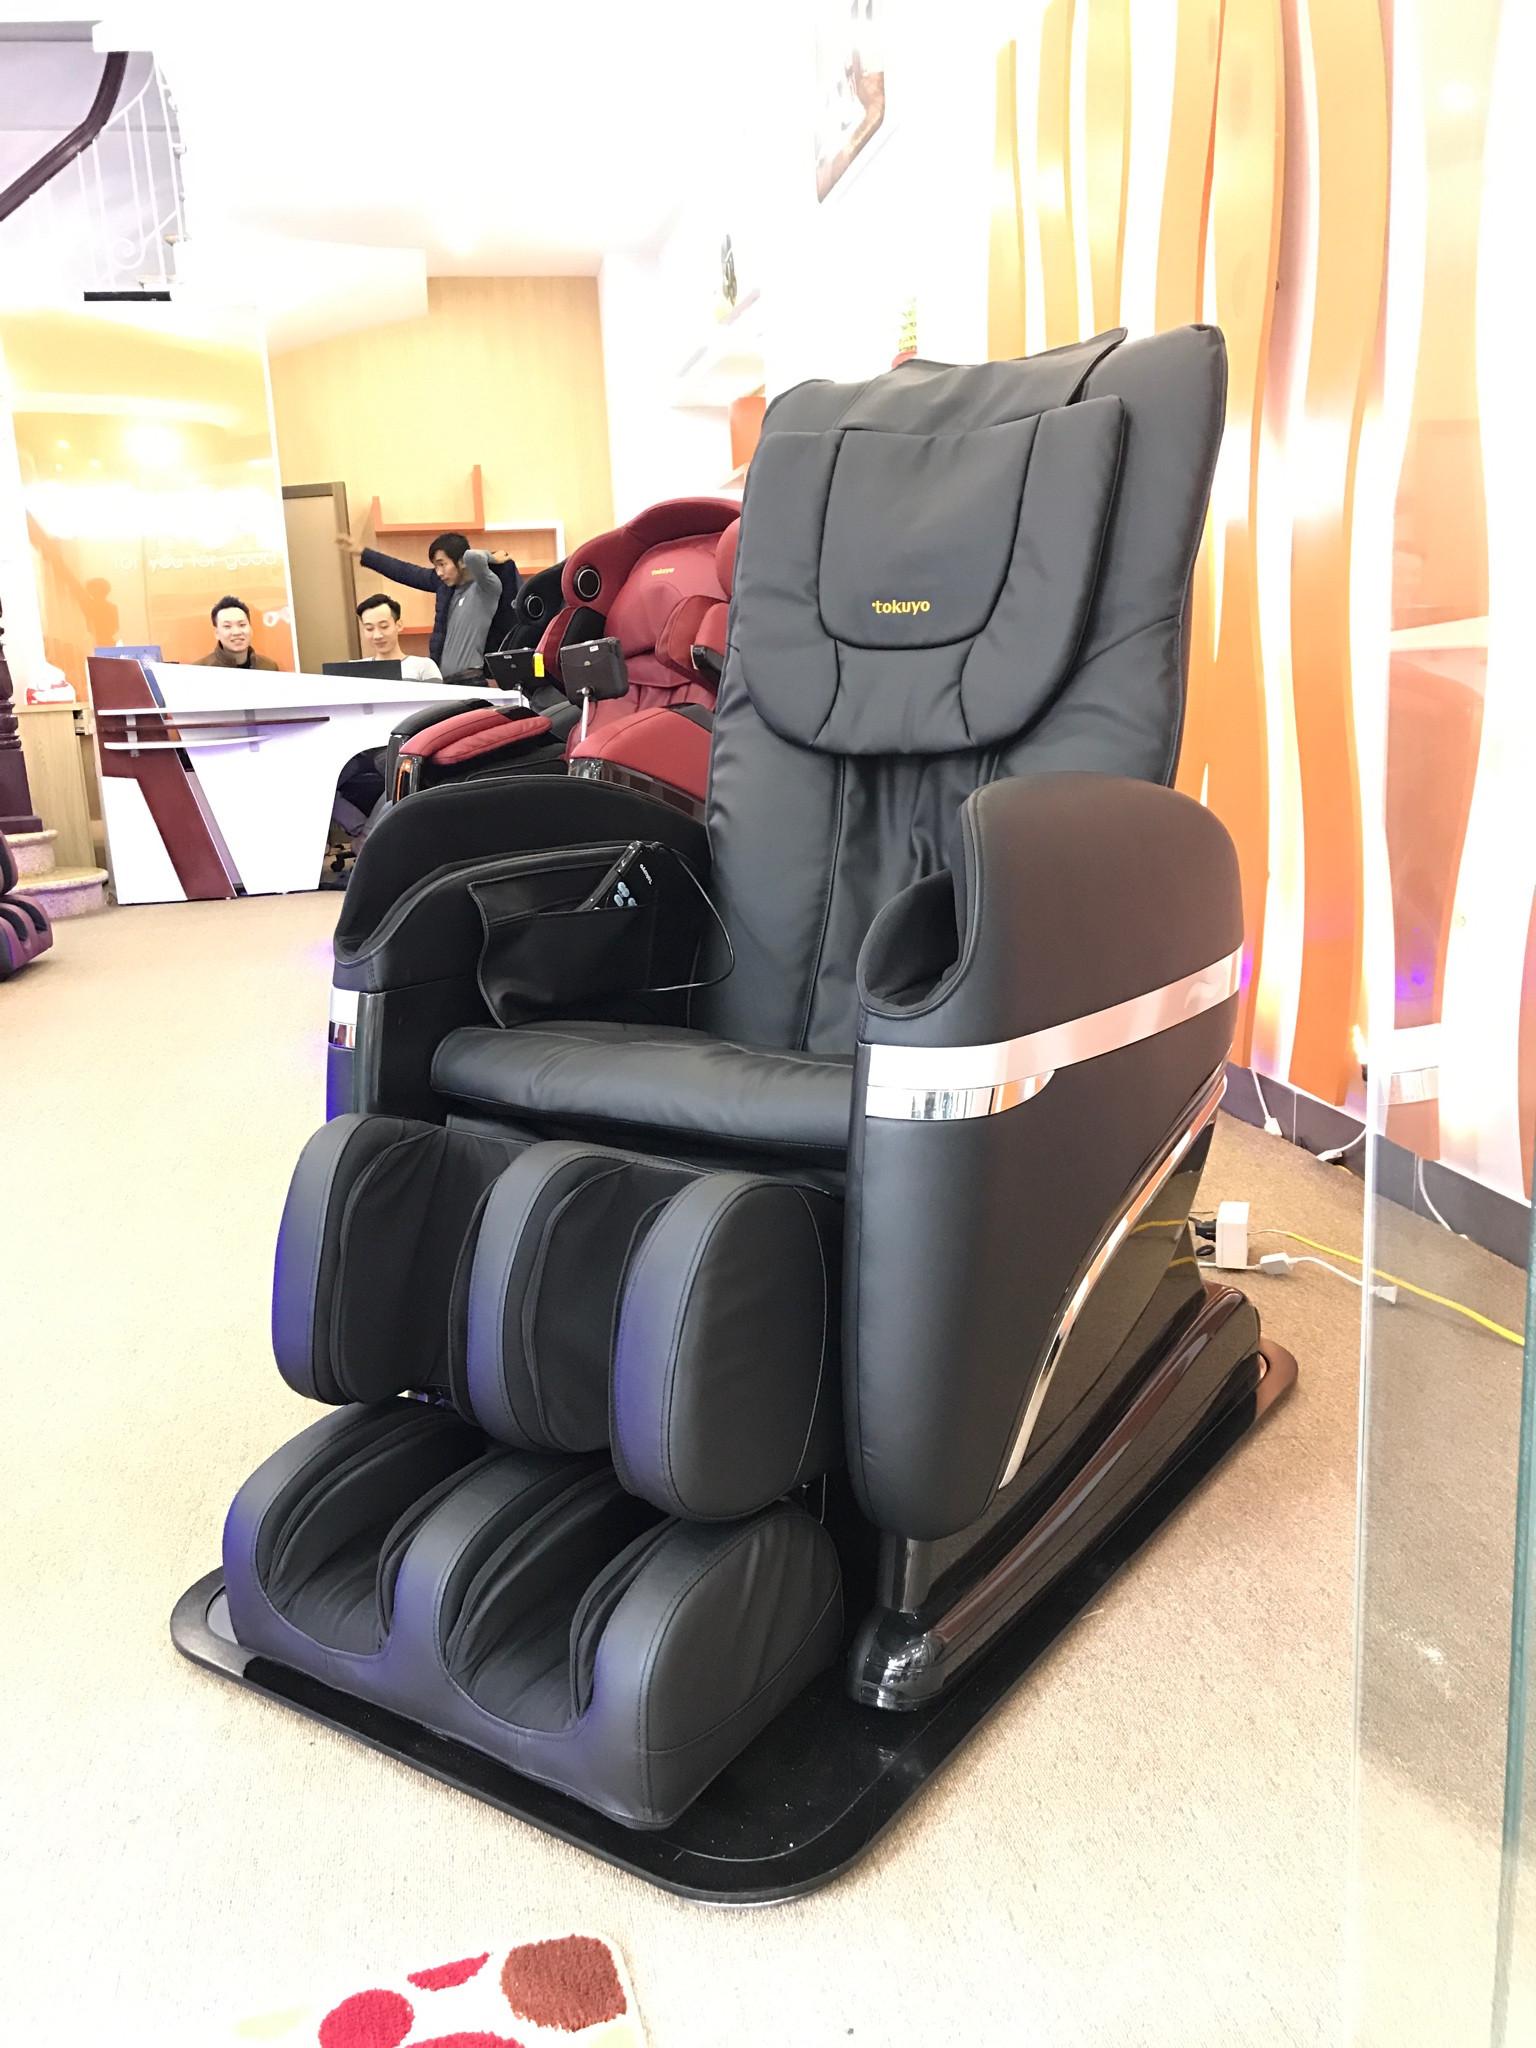 Ghế Massage Tokuyo TC-366 - Giá Tốt Nhất